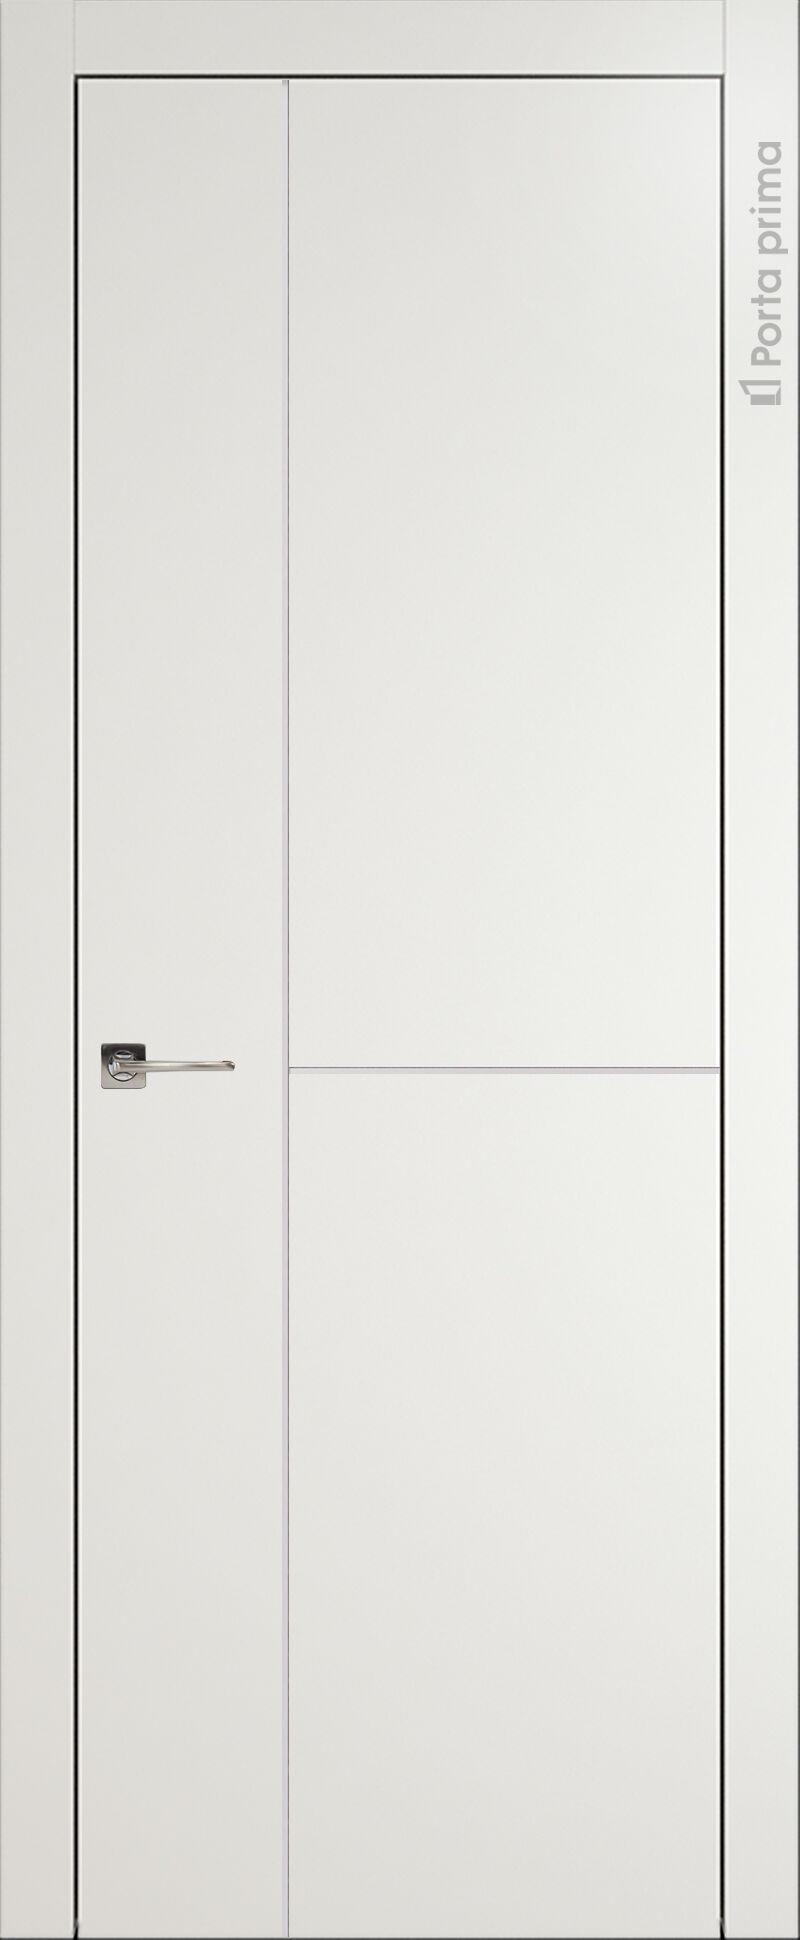 Tivoli Г-1 цвет - Бежевая эмаль (RAL 9010) Без стекла (ДГ)